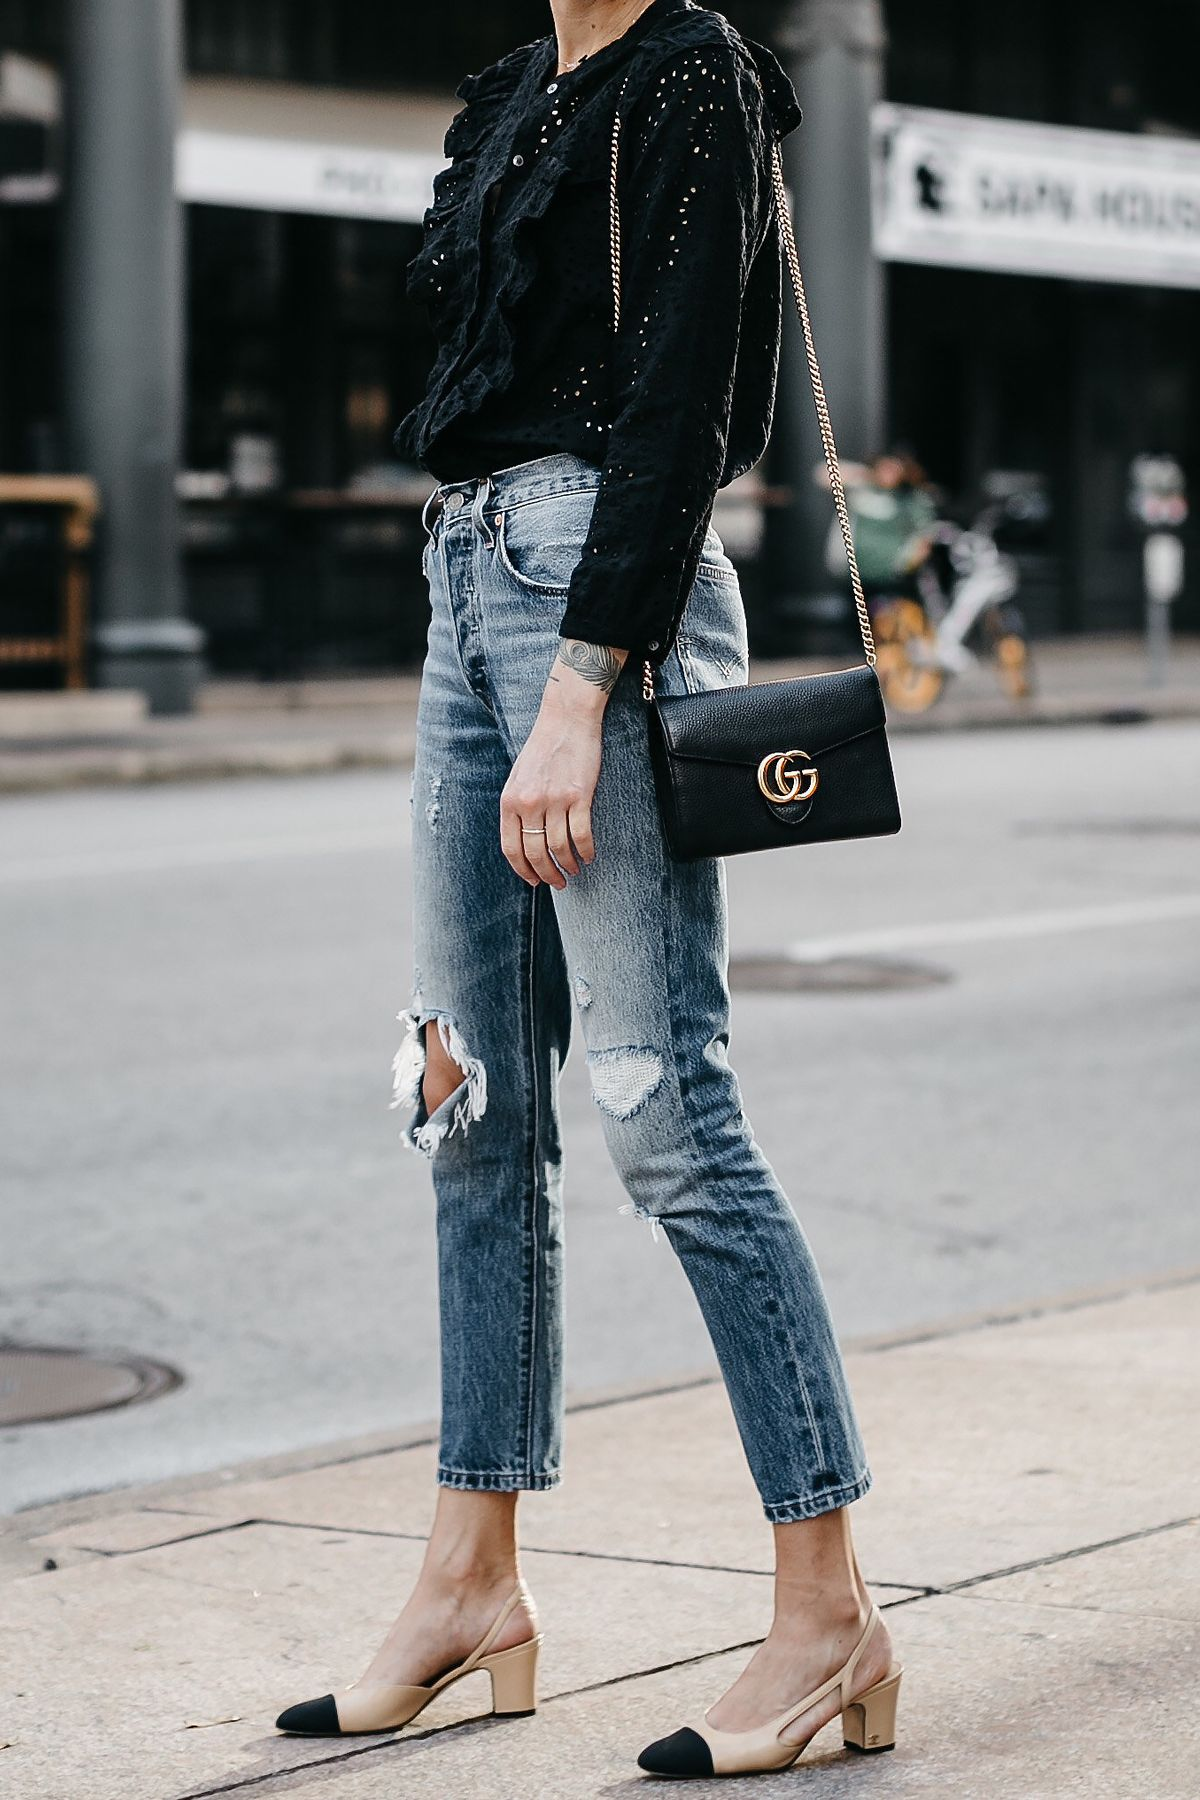 19c0d27d Madewell Black Eyelet Blouse Denim Ripped Skinny Jeans Chanel Slingbacks  Gucci Marmont Handbag Fashion Jackson Dallas Blogger Fashion Blogger Street  Style